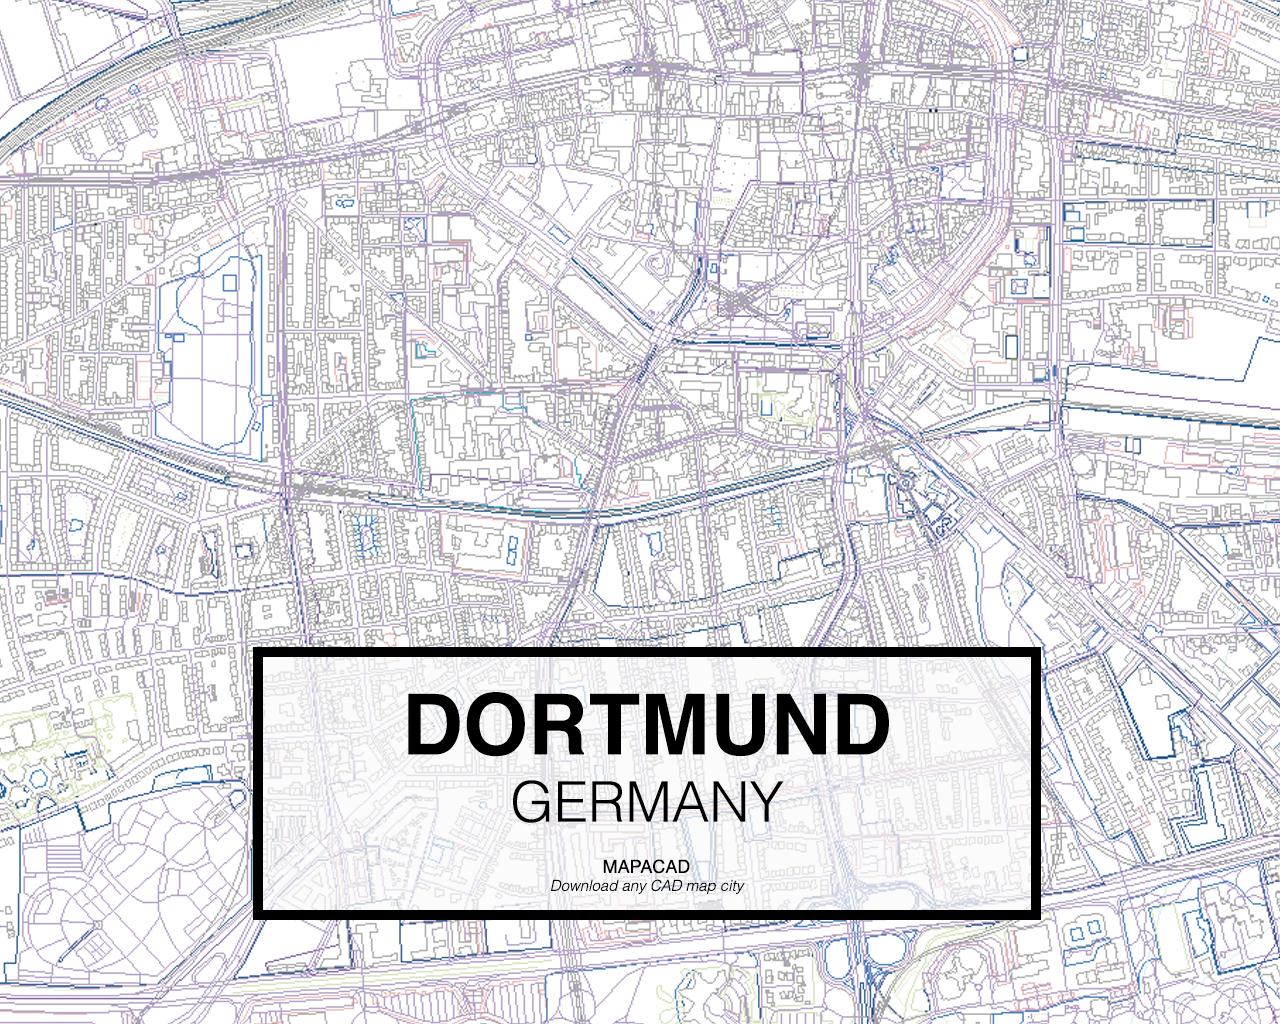 dortmund germany 02 mapacad download map cad dwg